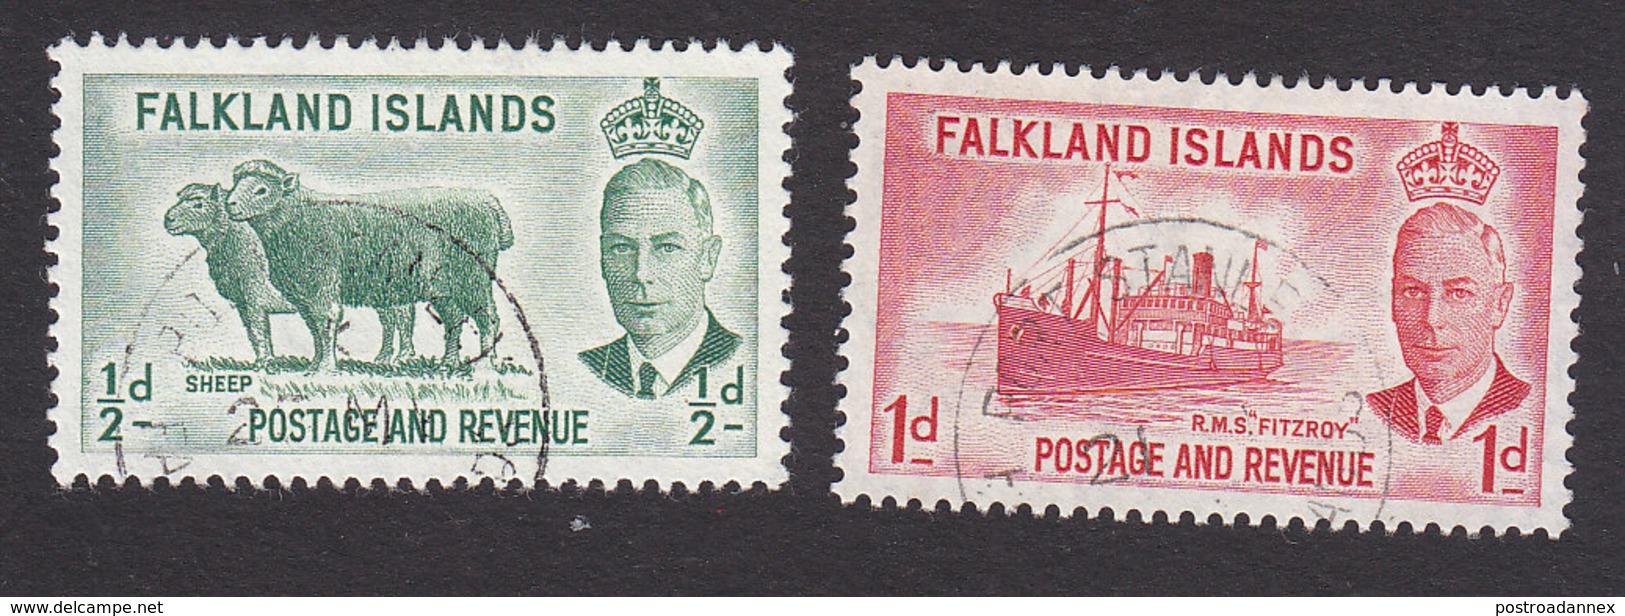 Falkland Islands, Scott #107-108, Used, George V And Industry Of Falkland Islands, Issued 1952 - Falkland Islands